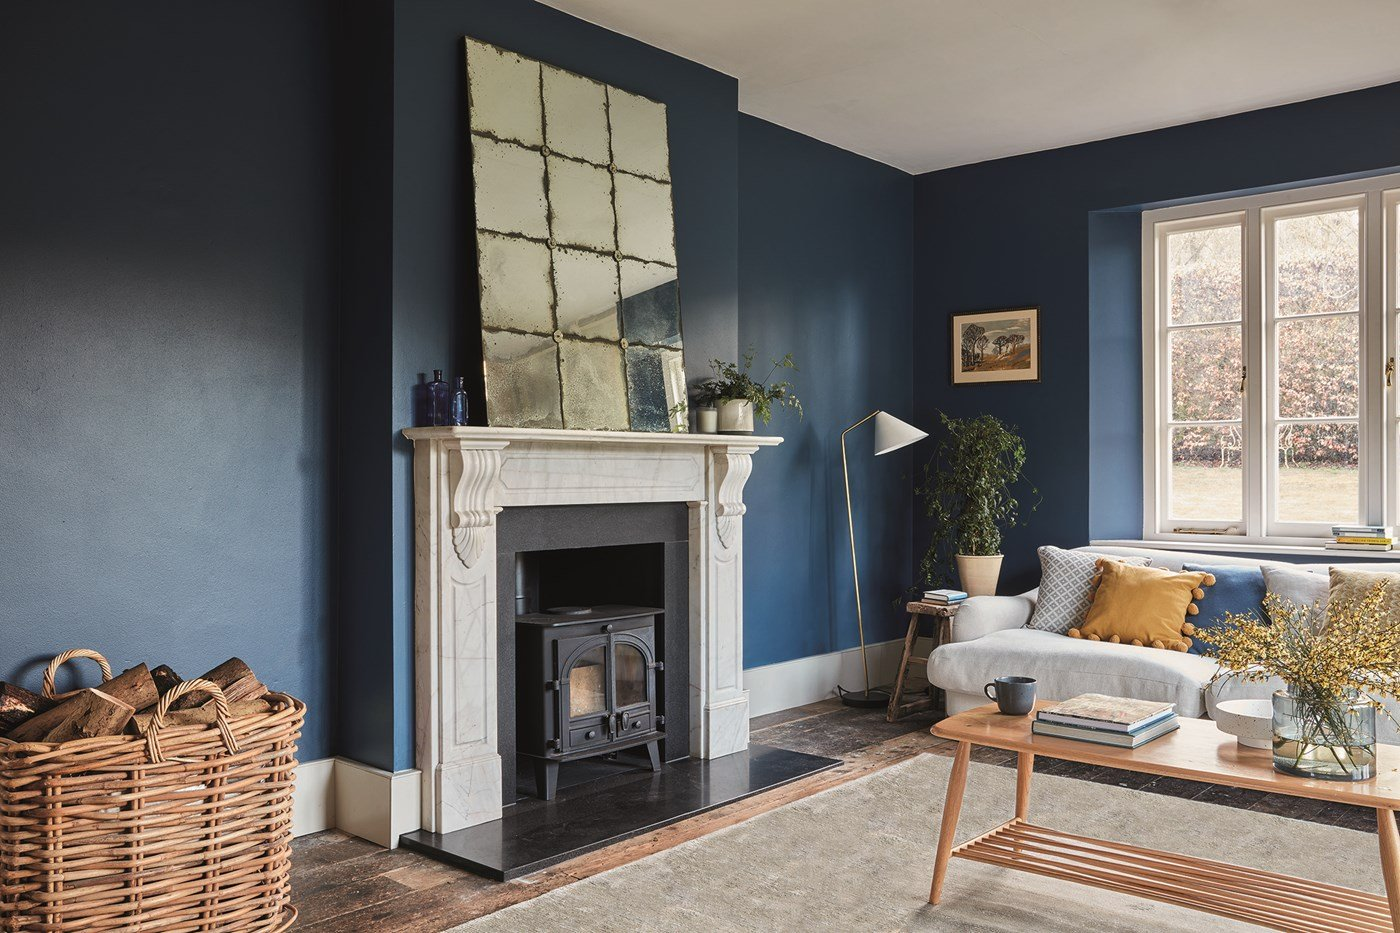 Farrow and Ball 2021 colour trends - Stiffkey Blue